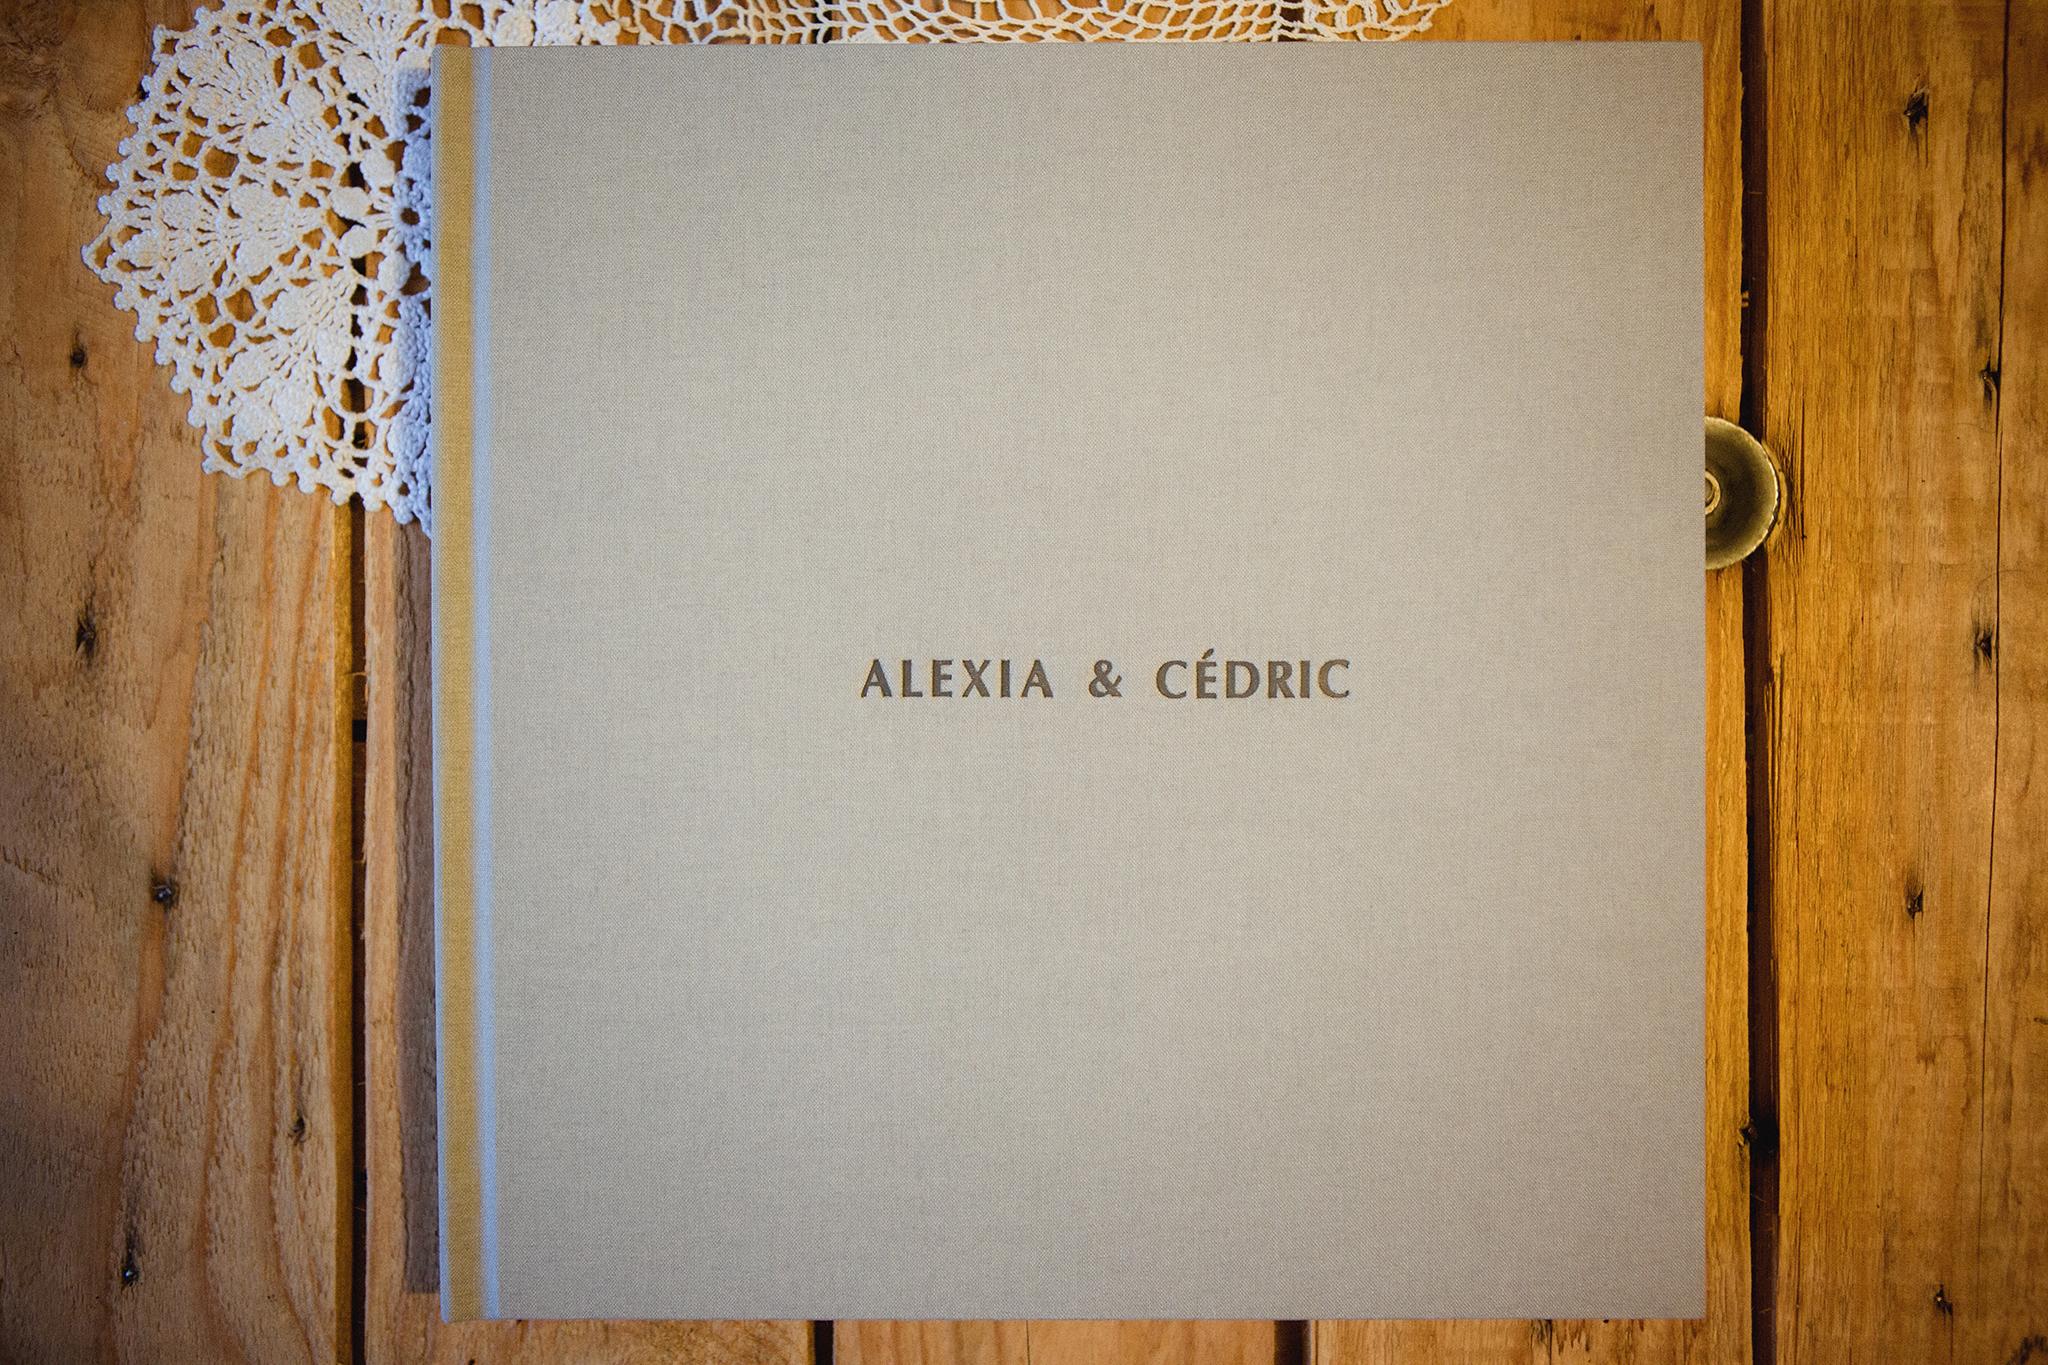 album-photo-professionnel-couverture-tissus